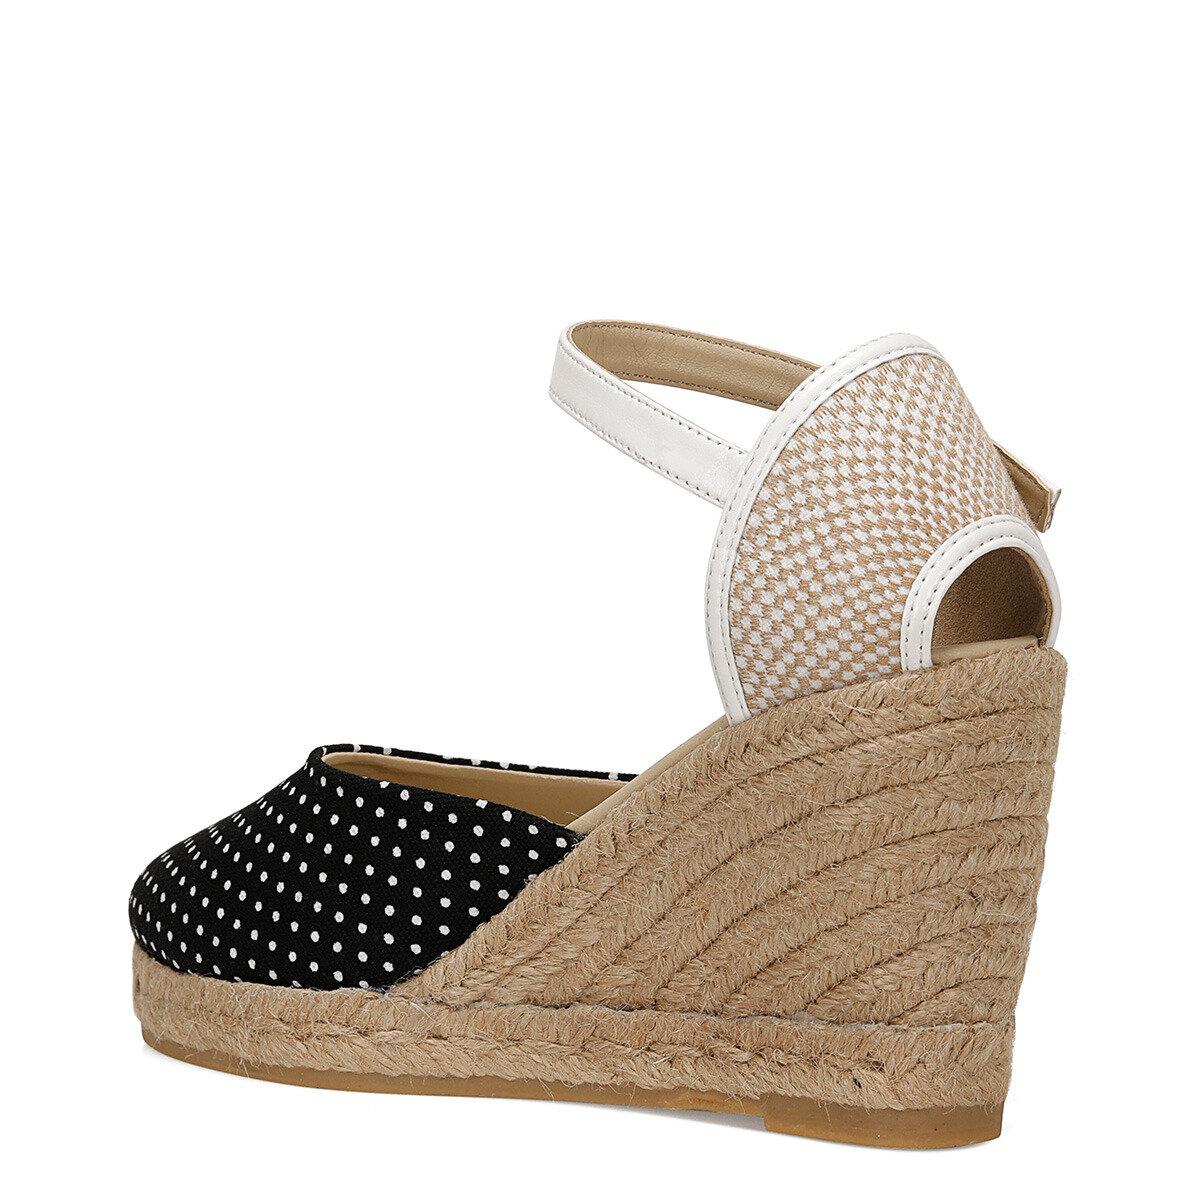 KAHLO Siyah Kadın Topuklu Ayakkabı